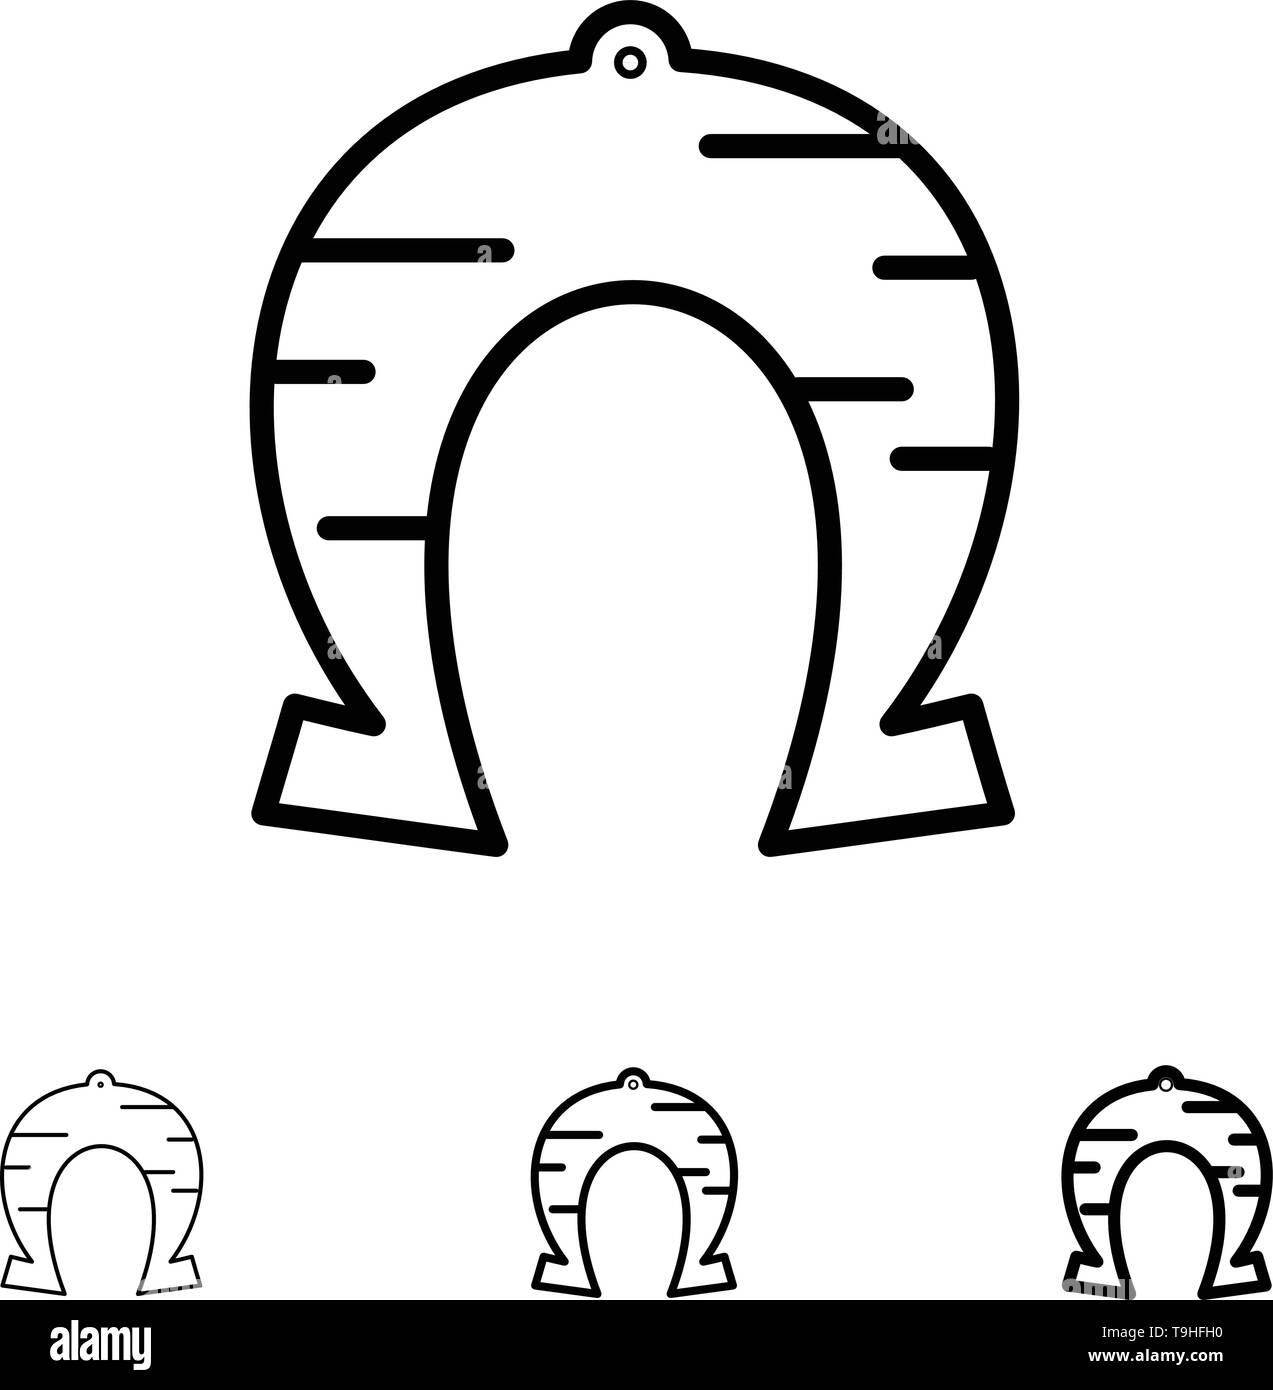 Festival, Fortune, Horseshoe, Luck, Patrick Bold and thin black line icon set - Stock Image